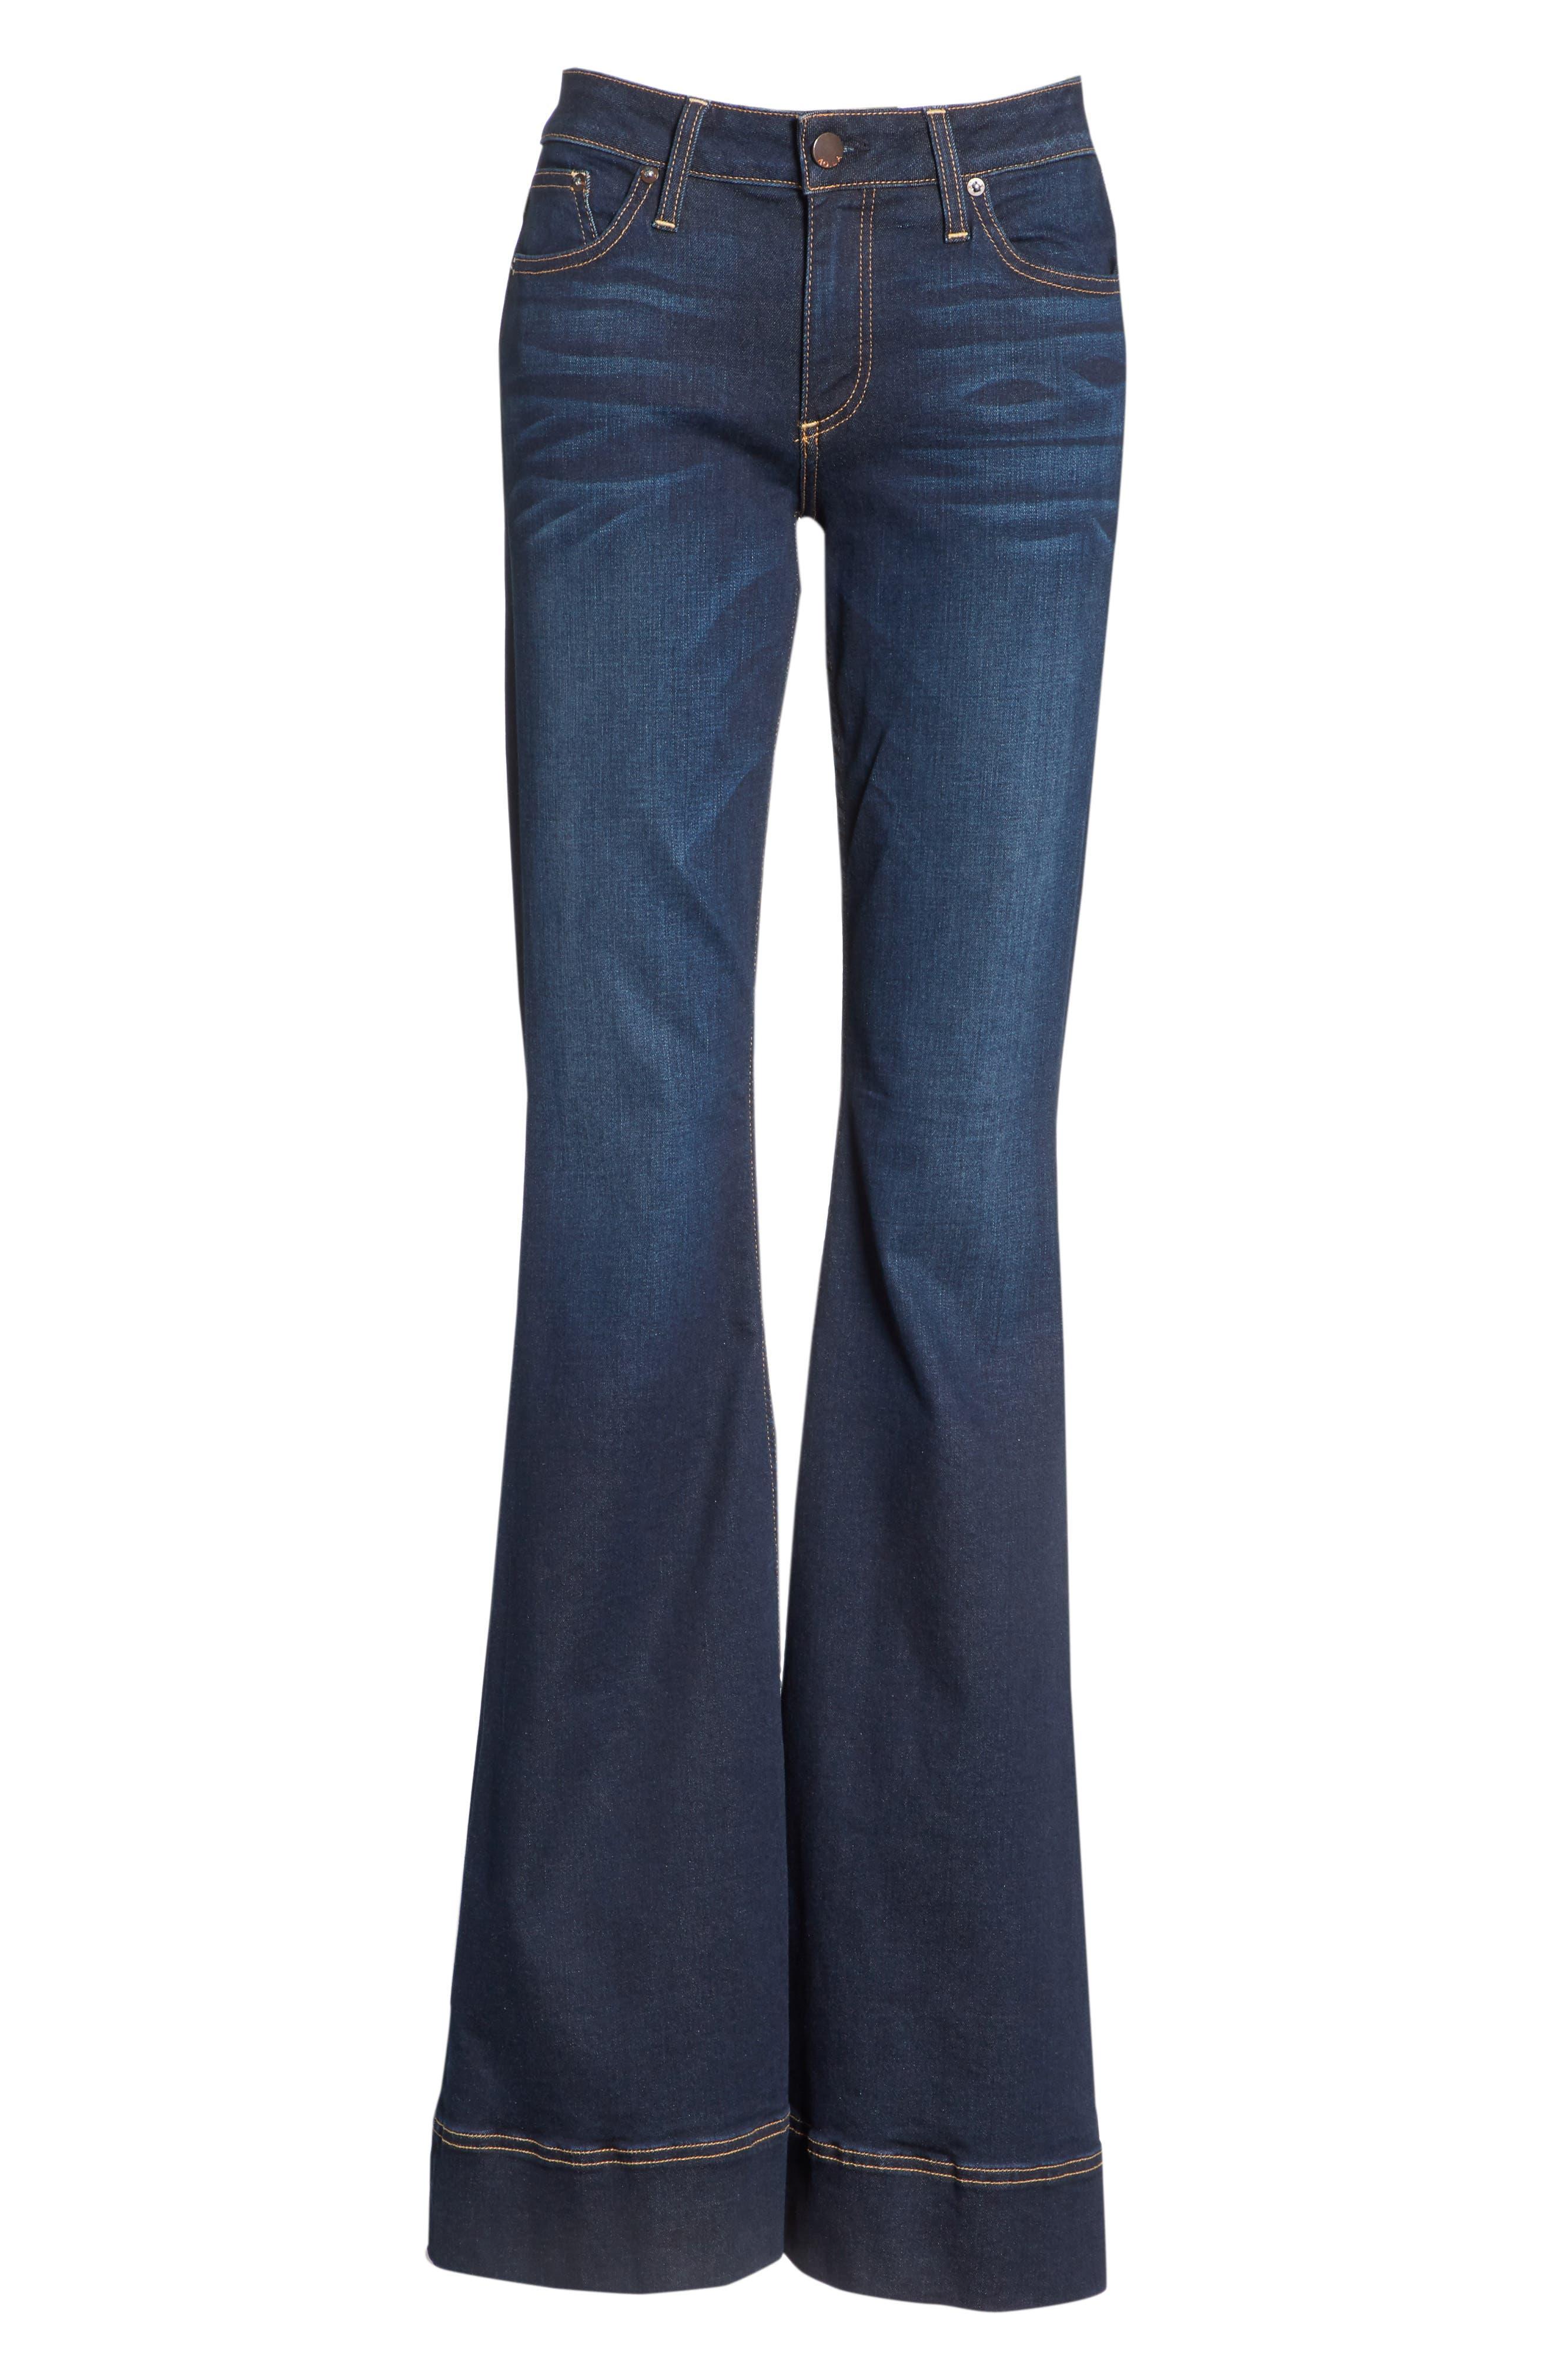 AO.LA Beautiful Bell Bottom Jeans,                             Alternate thumbnail 6, color,                             TRUST ME